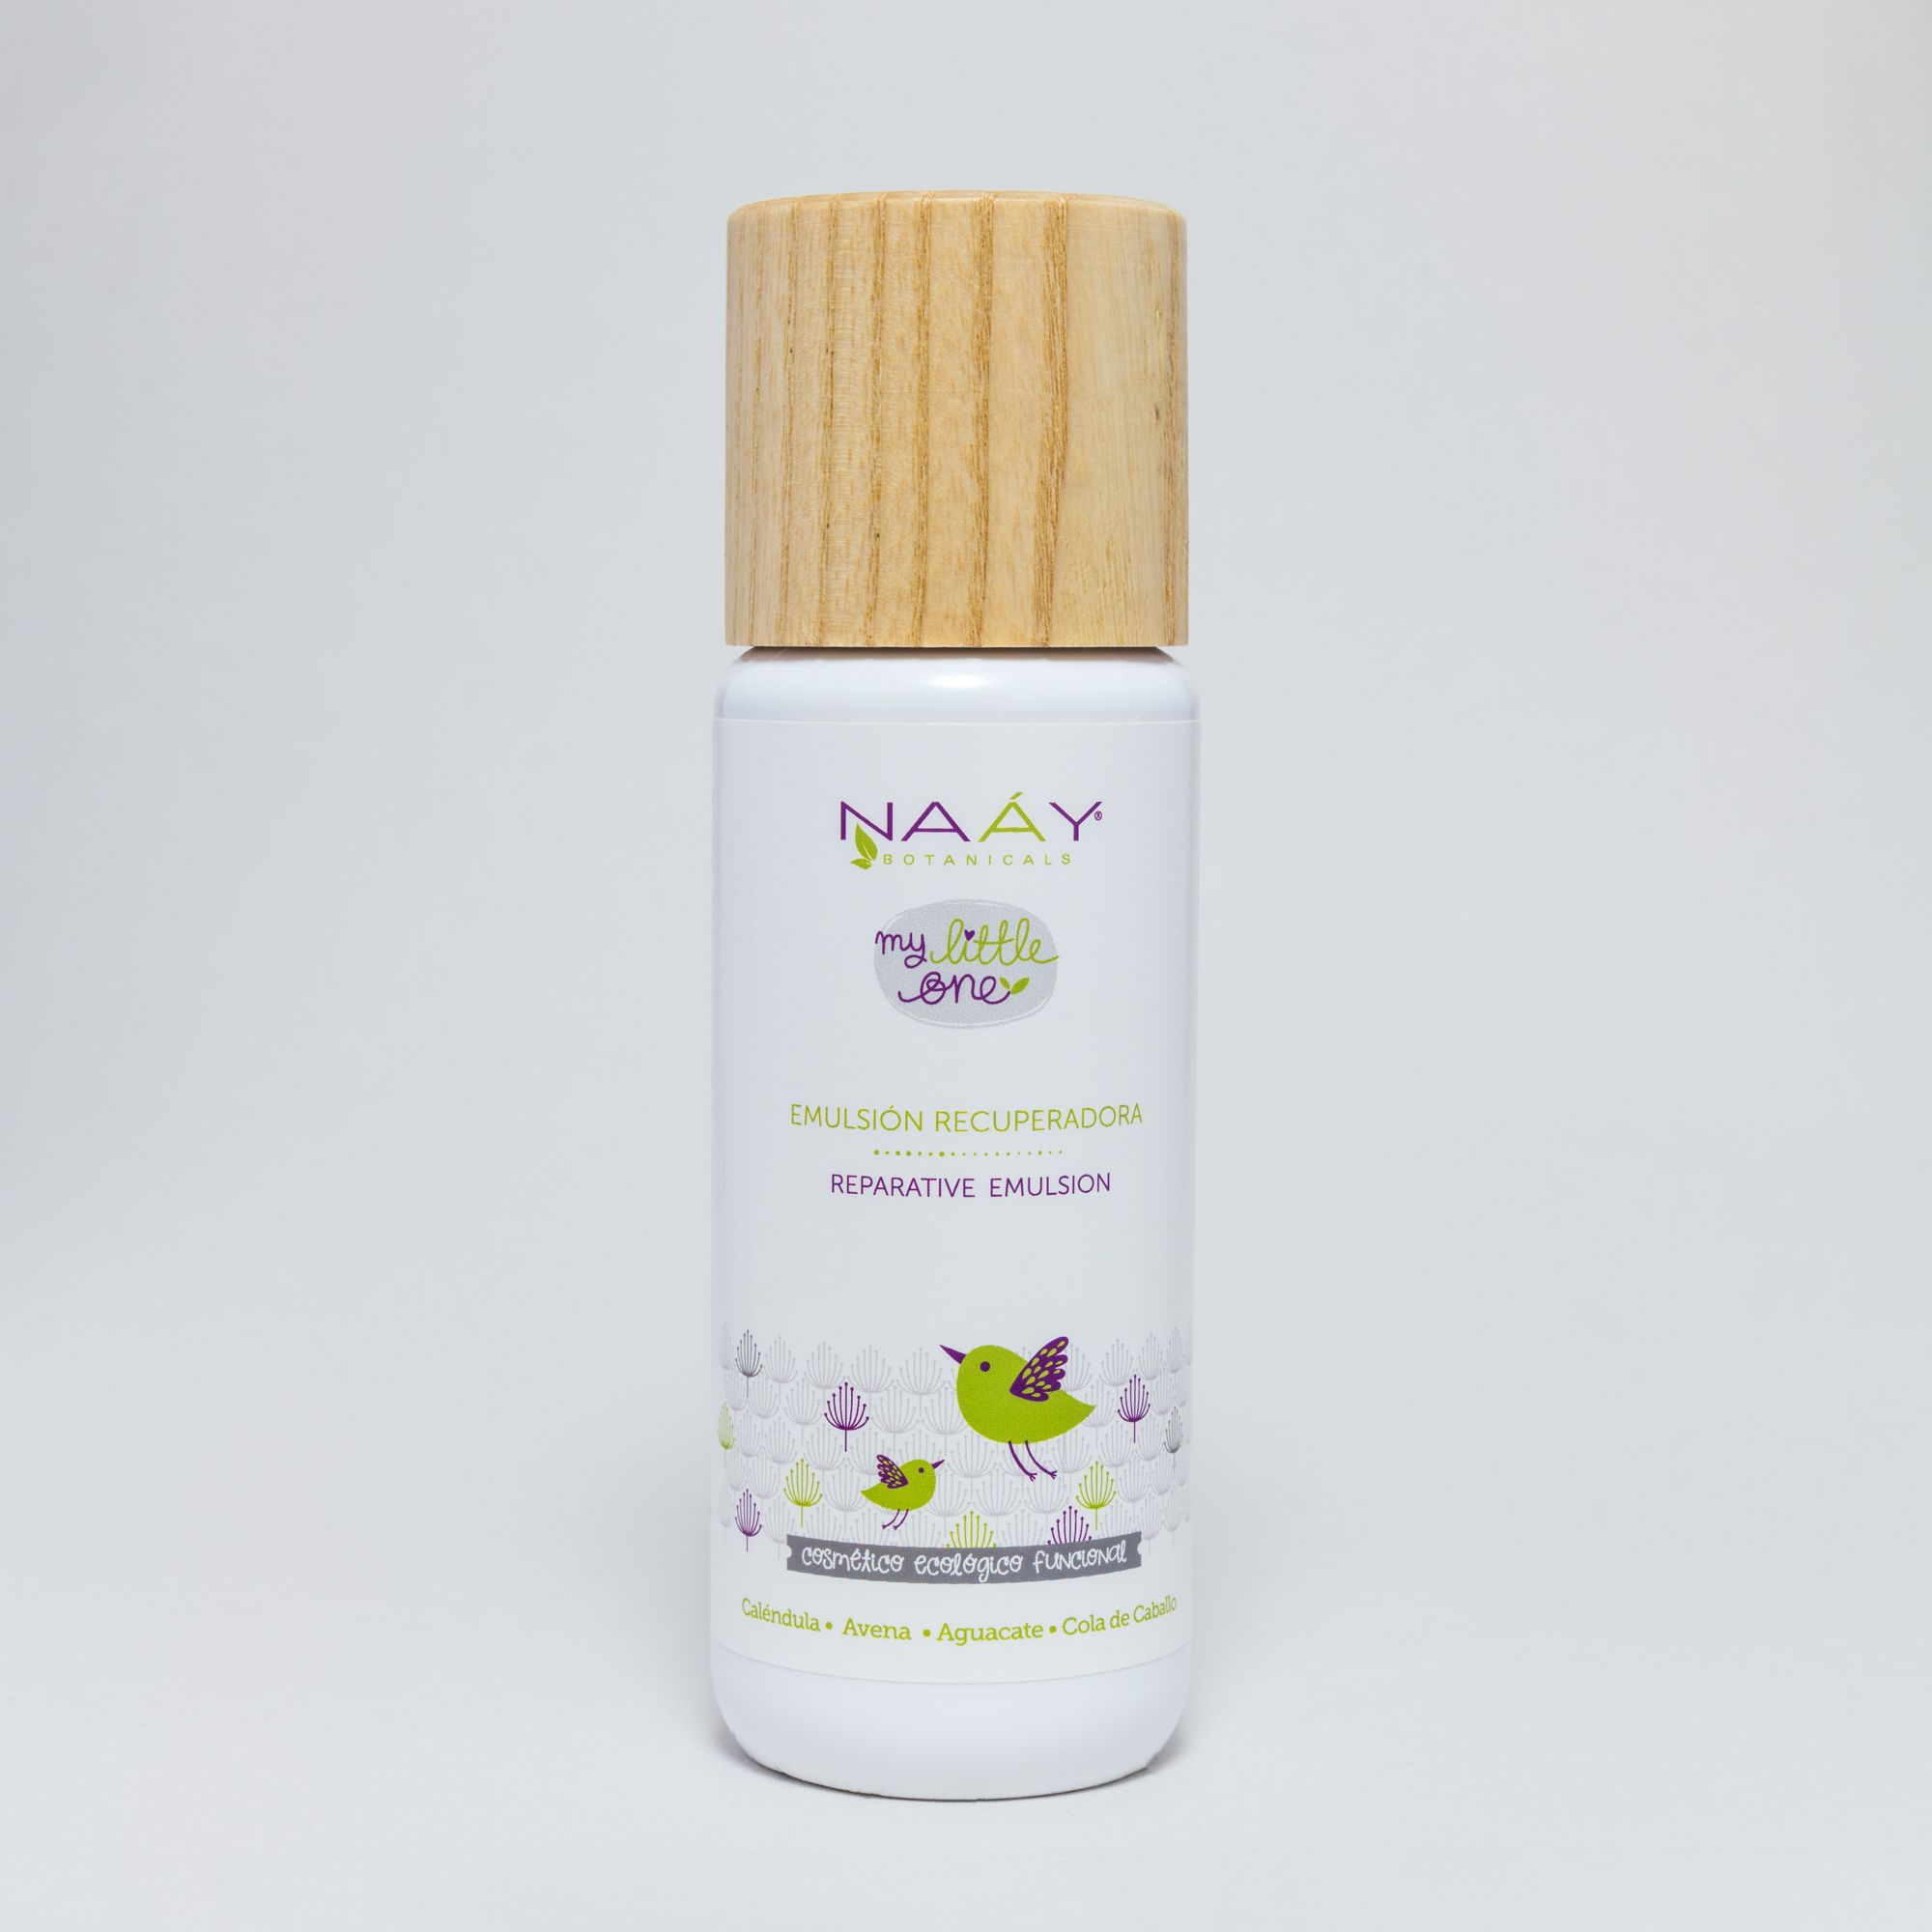 EMULSION RECUPERADORA 200 ml - Naay